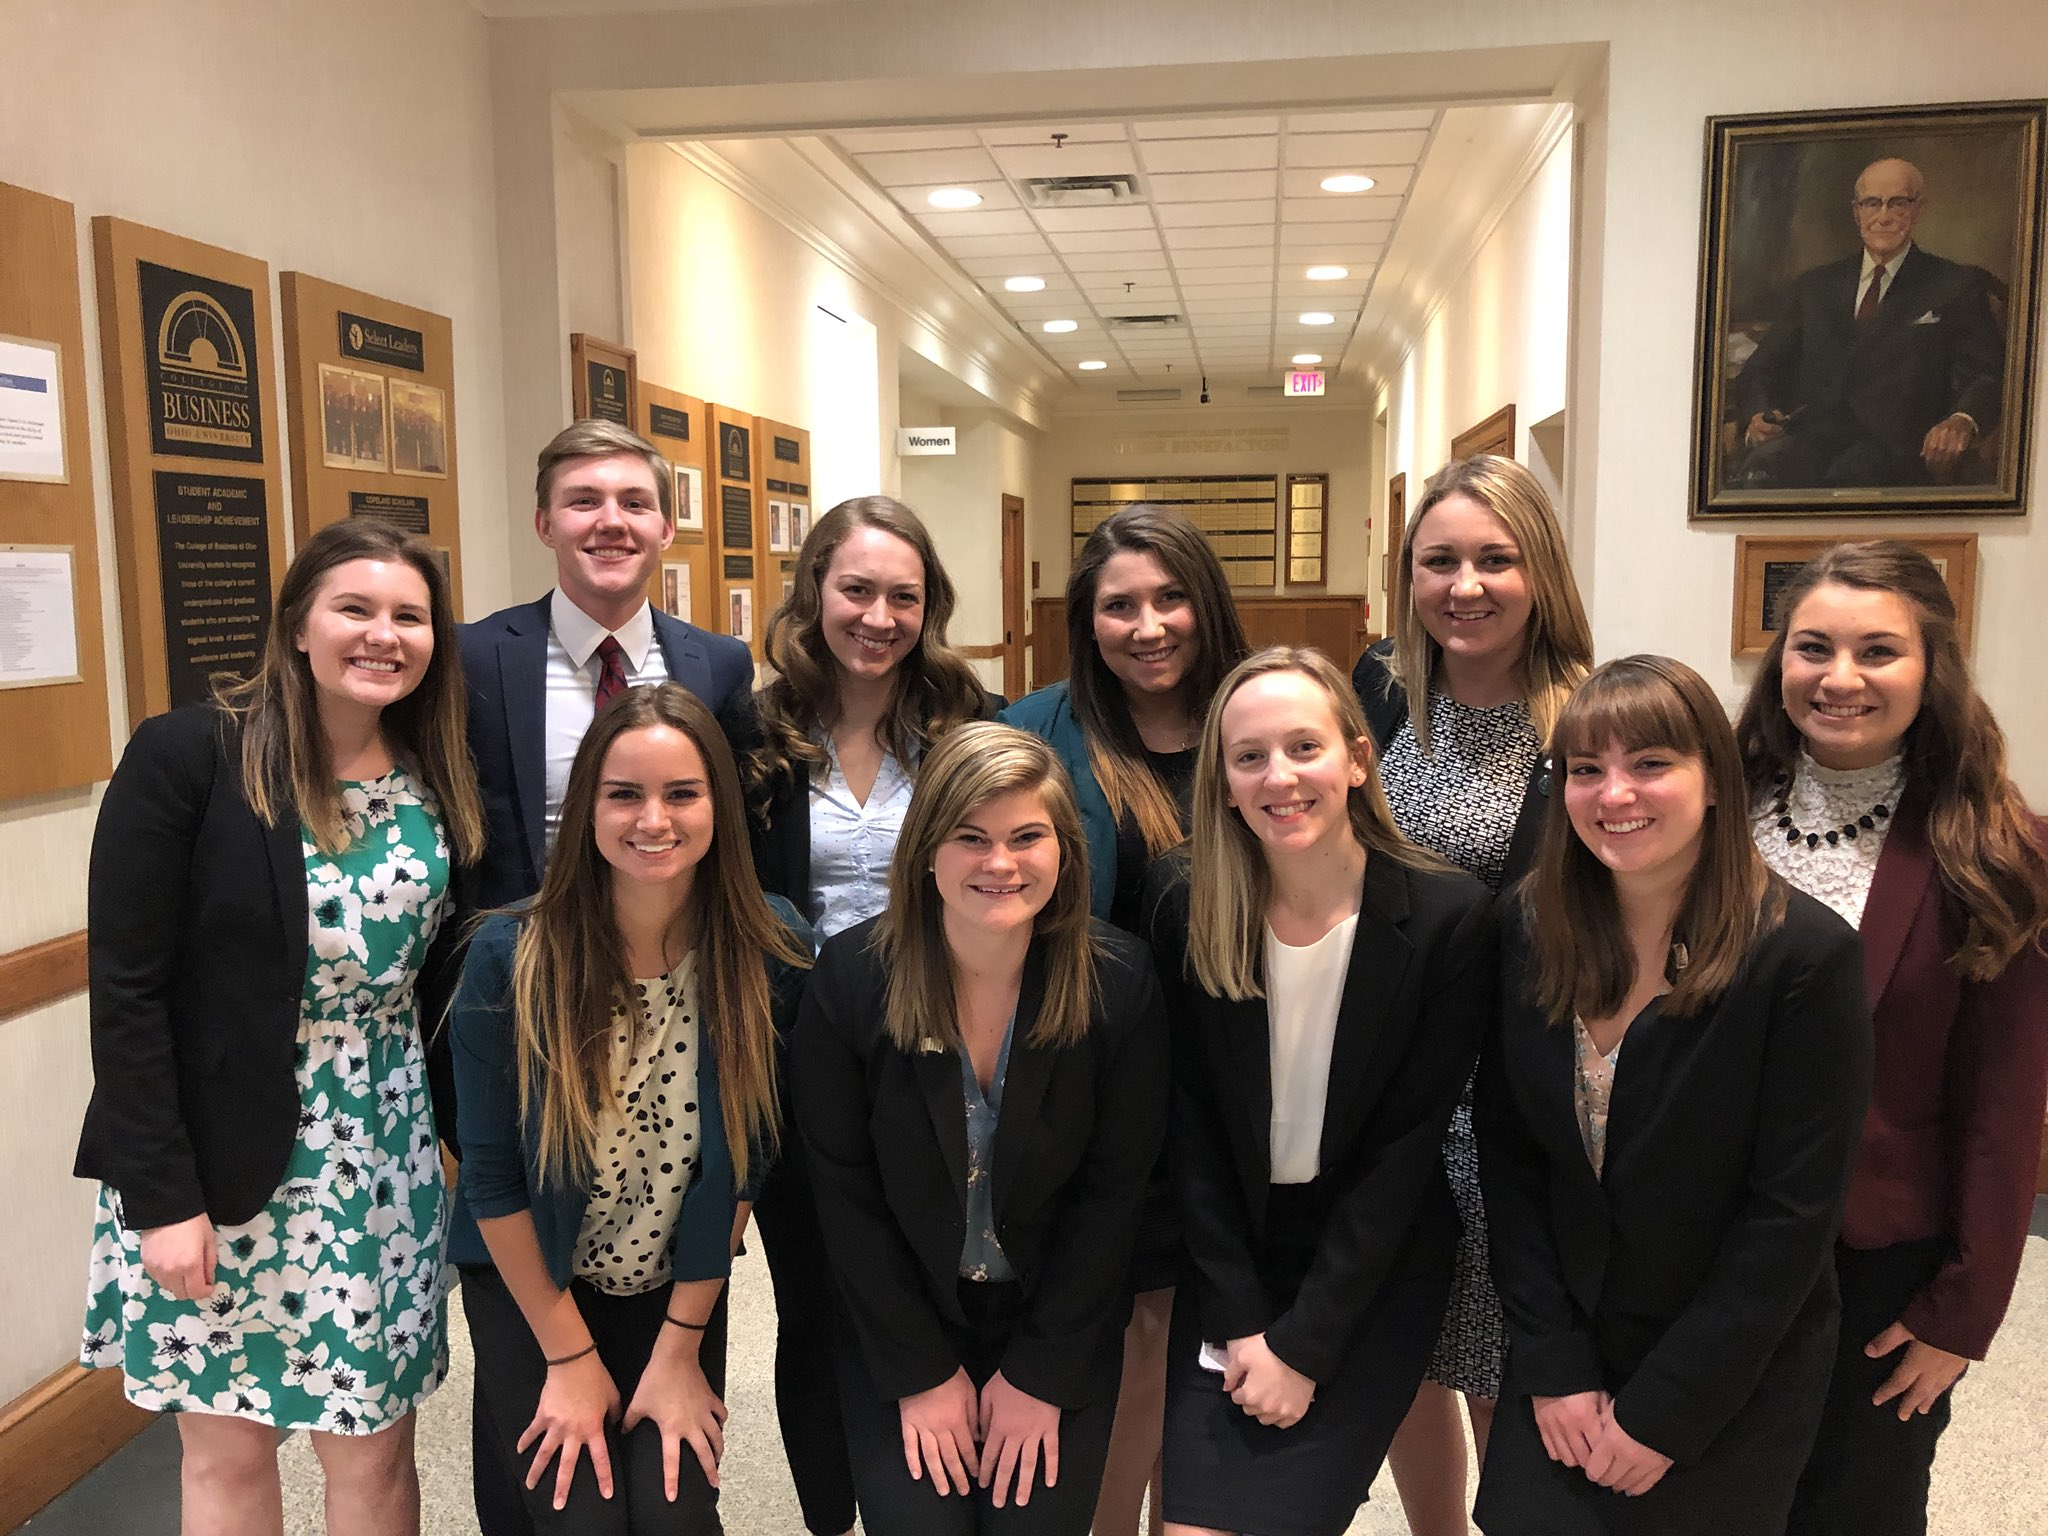 Congratulations to our 2018-2019 Executive Board!